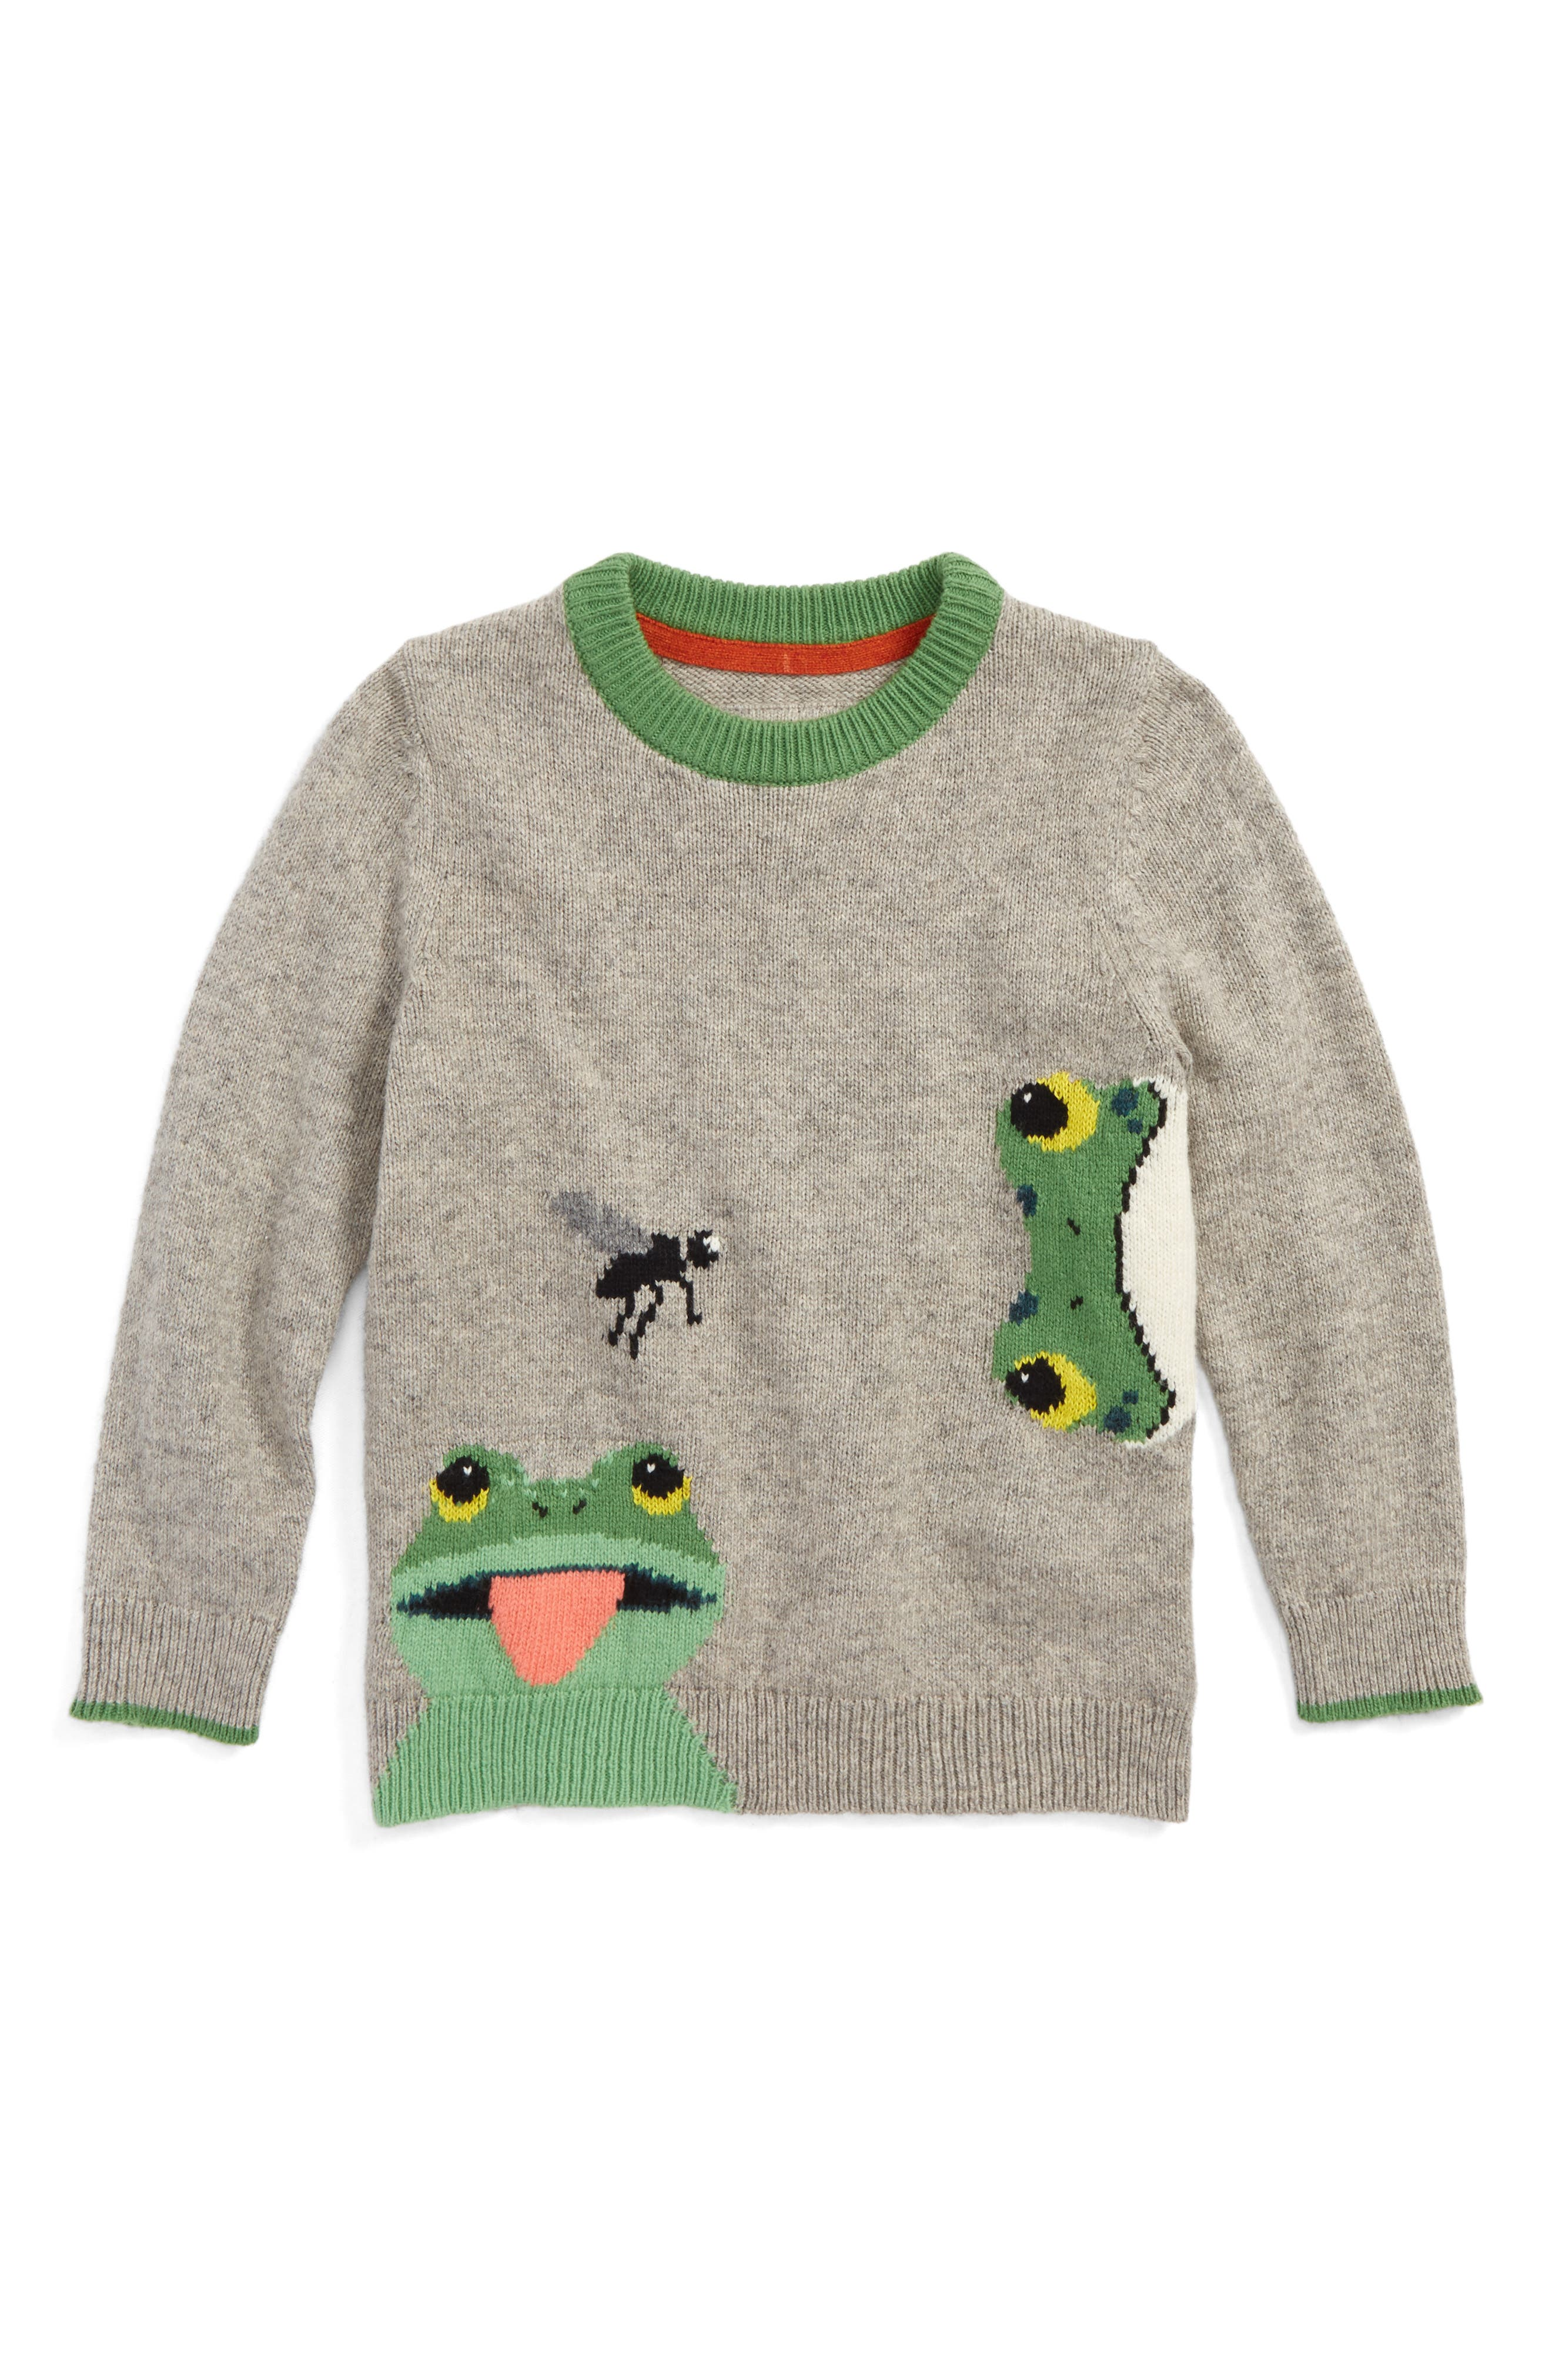 Main Image - Mini Boden Wild Adventure Intarsia Sweater (Toddler Boys, Little Boys & Big Boys)